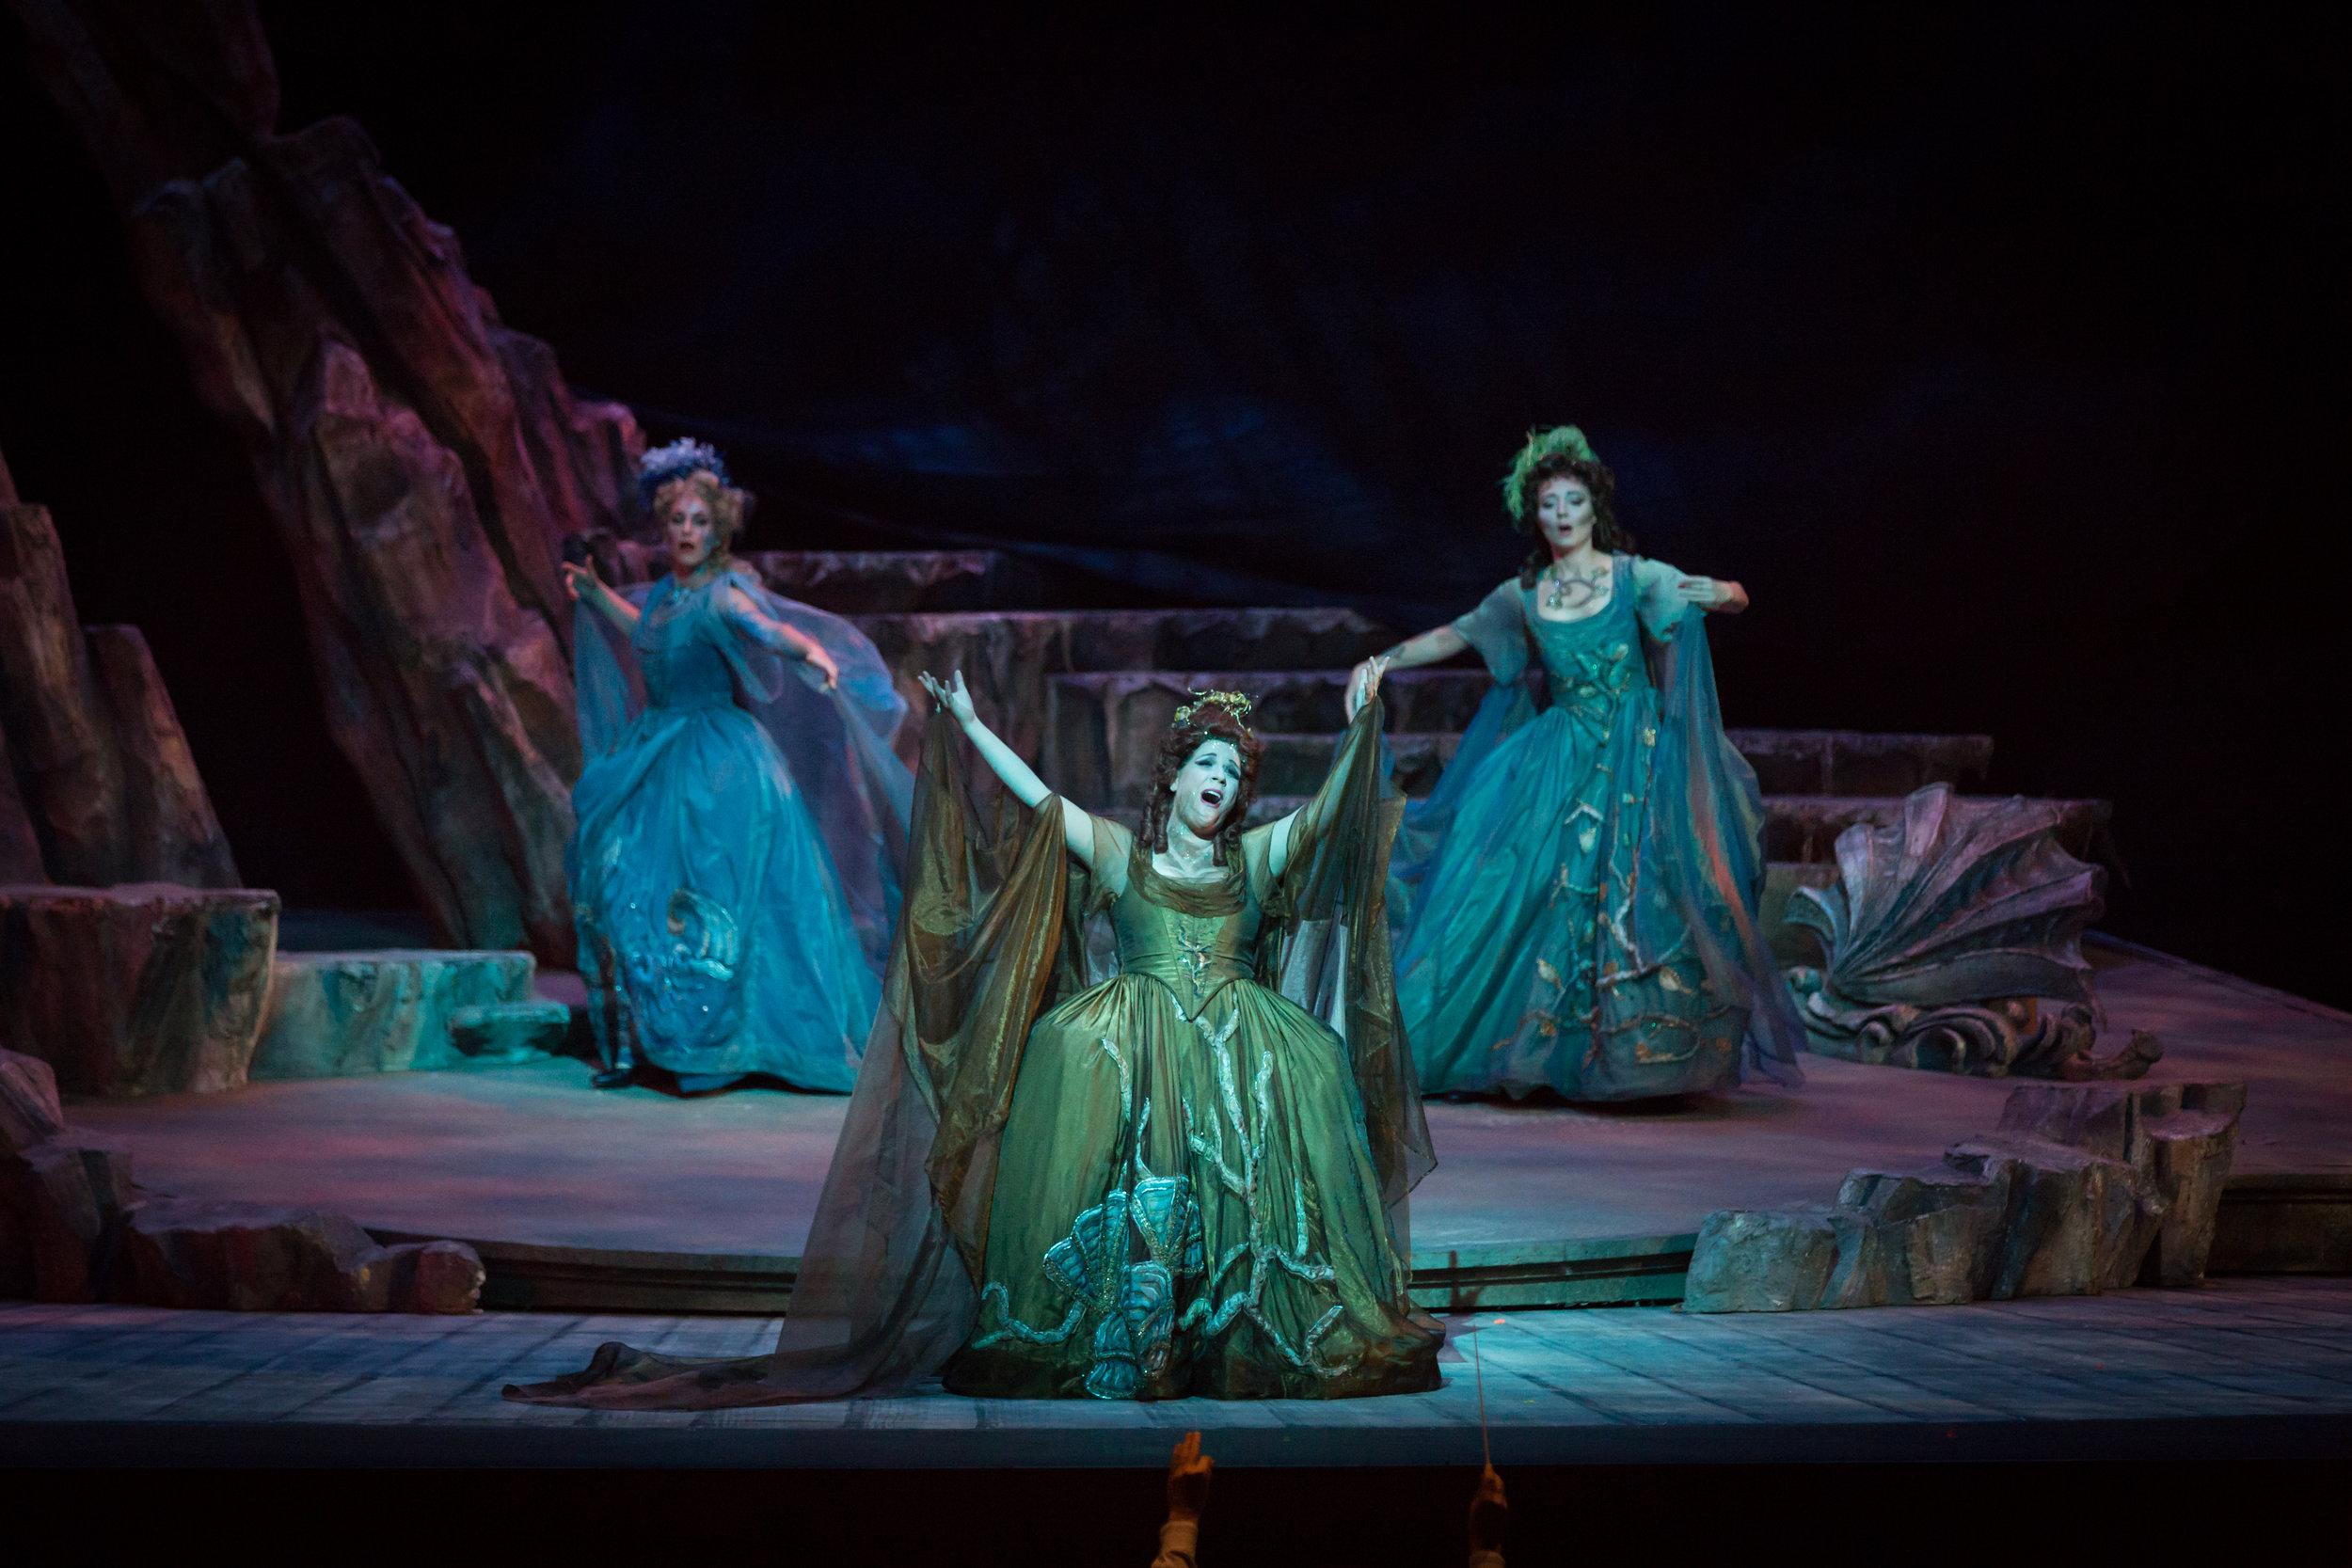 Photo credit: Palm Beach Opera  Echo in Ariadne auf Naxos   With Jessica Fishenfeld and Fleur Barron